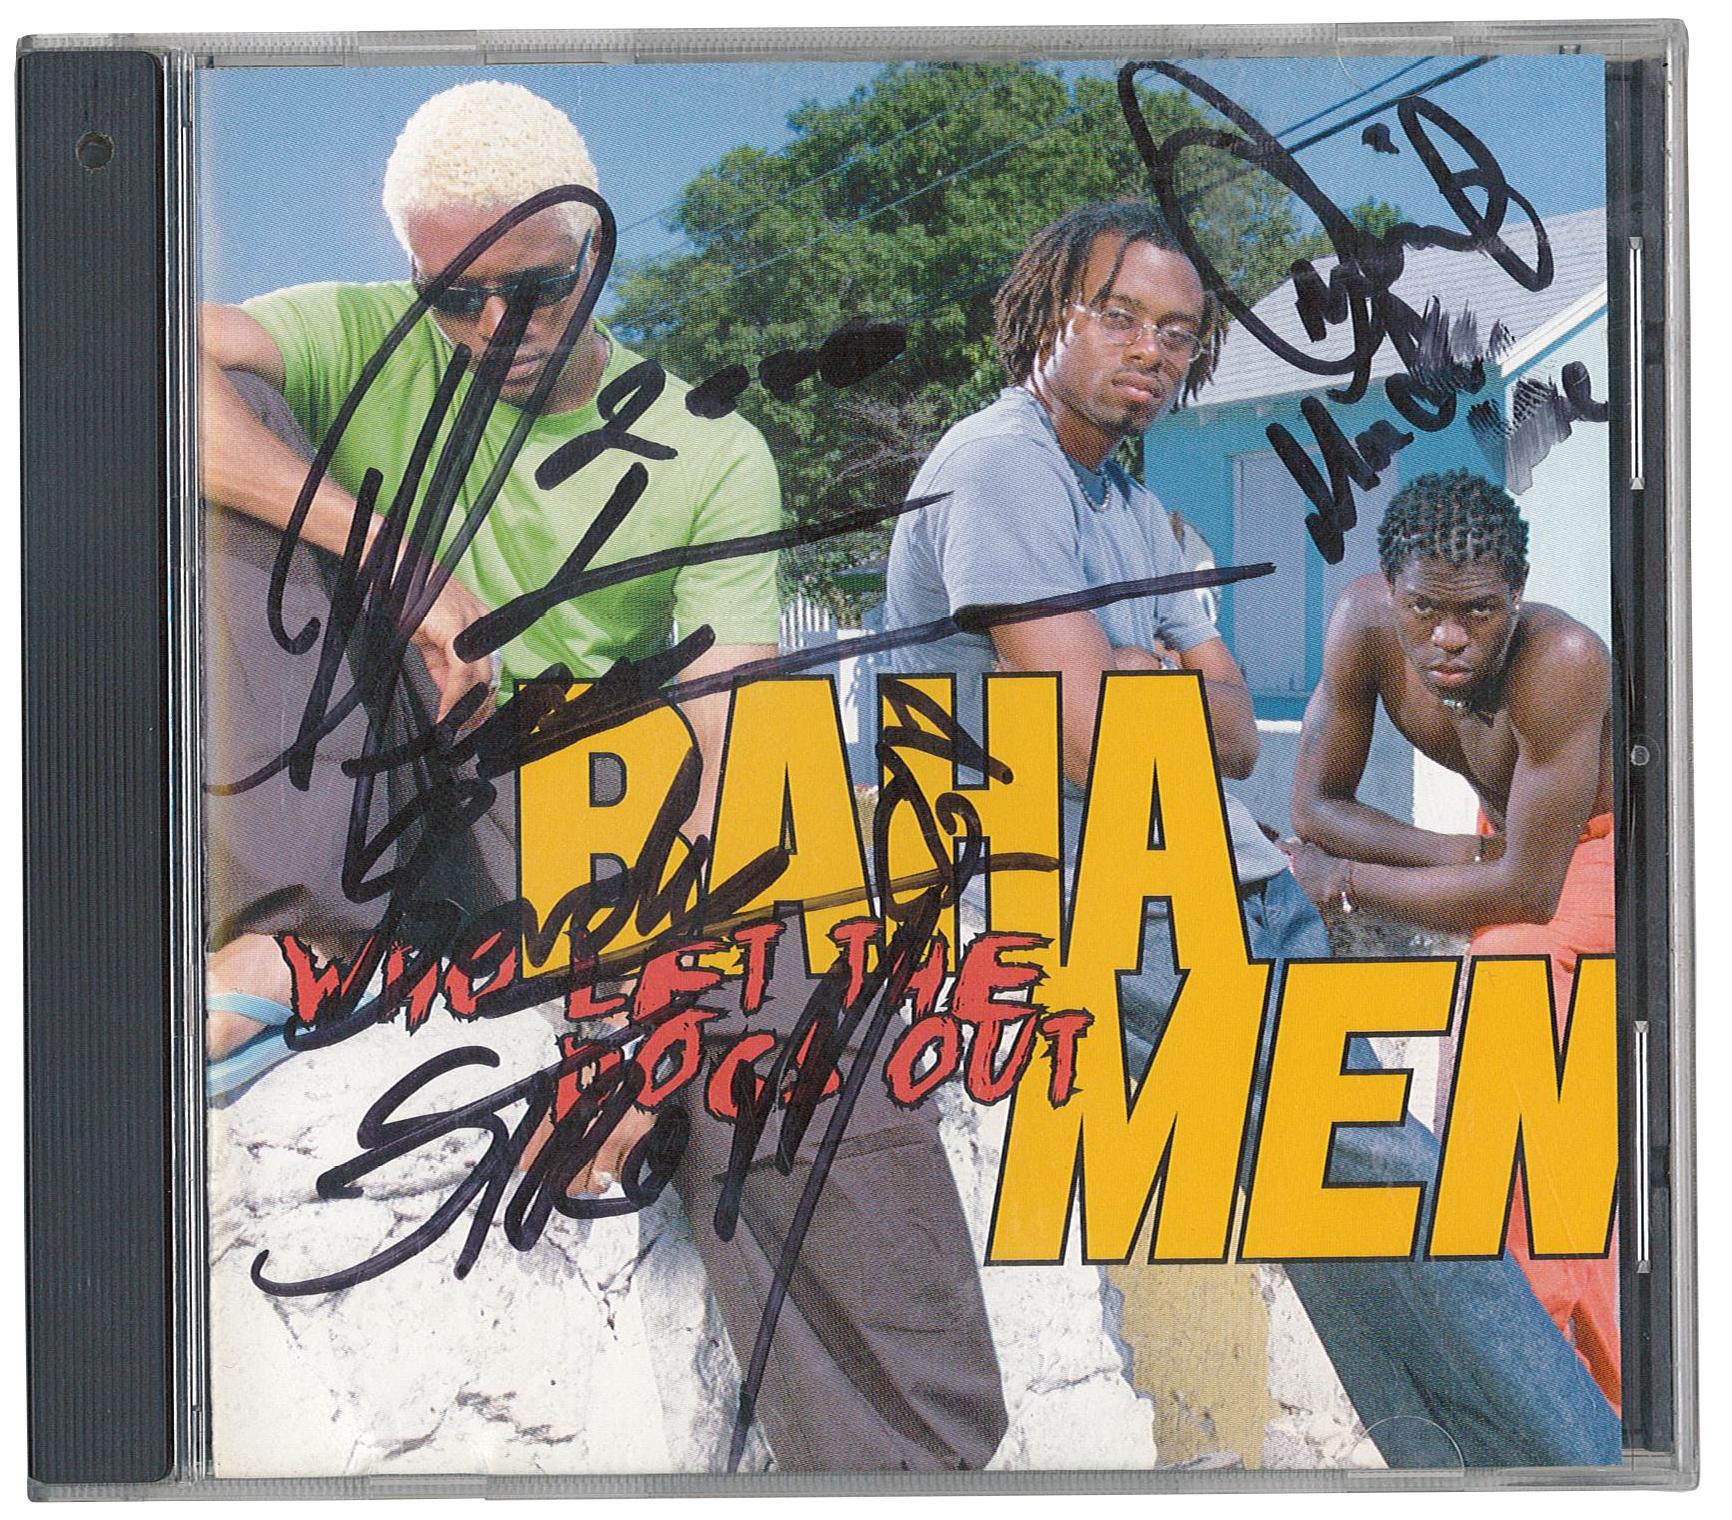 WLWLTDOO-2000-CD-BAHA_MEN-WLTDO-SIGNED_BOOK_COPY-FRONT-751052.jpg